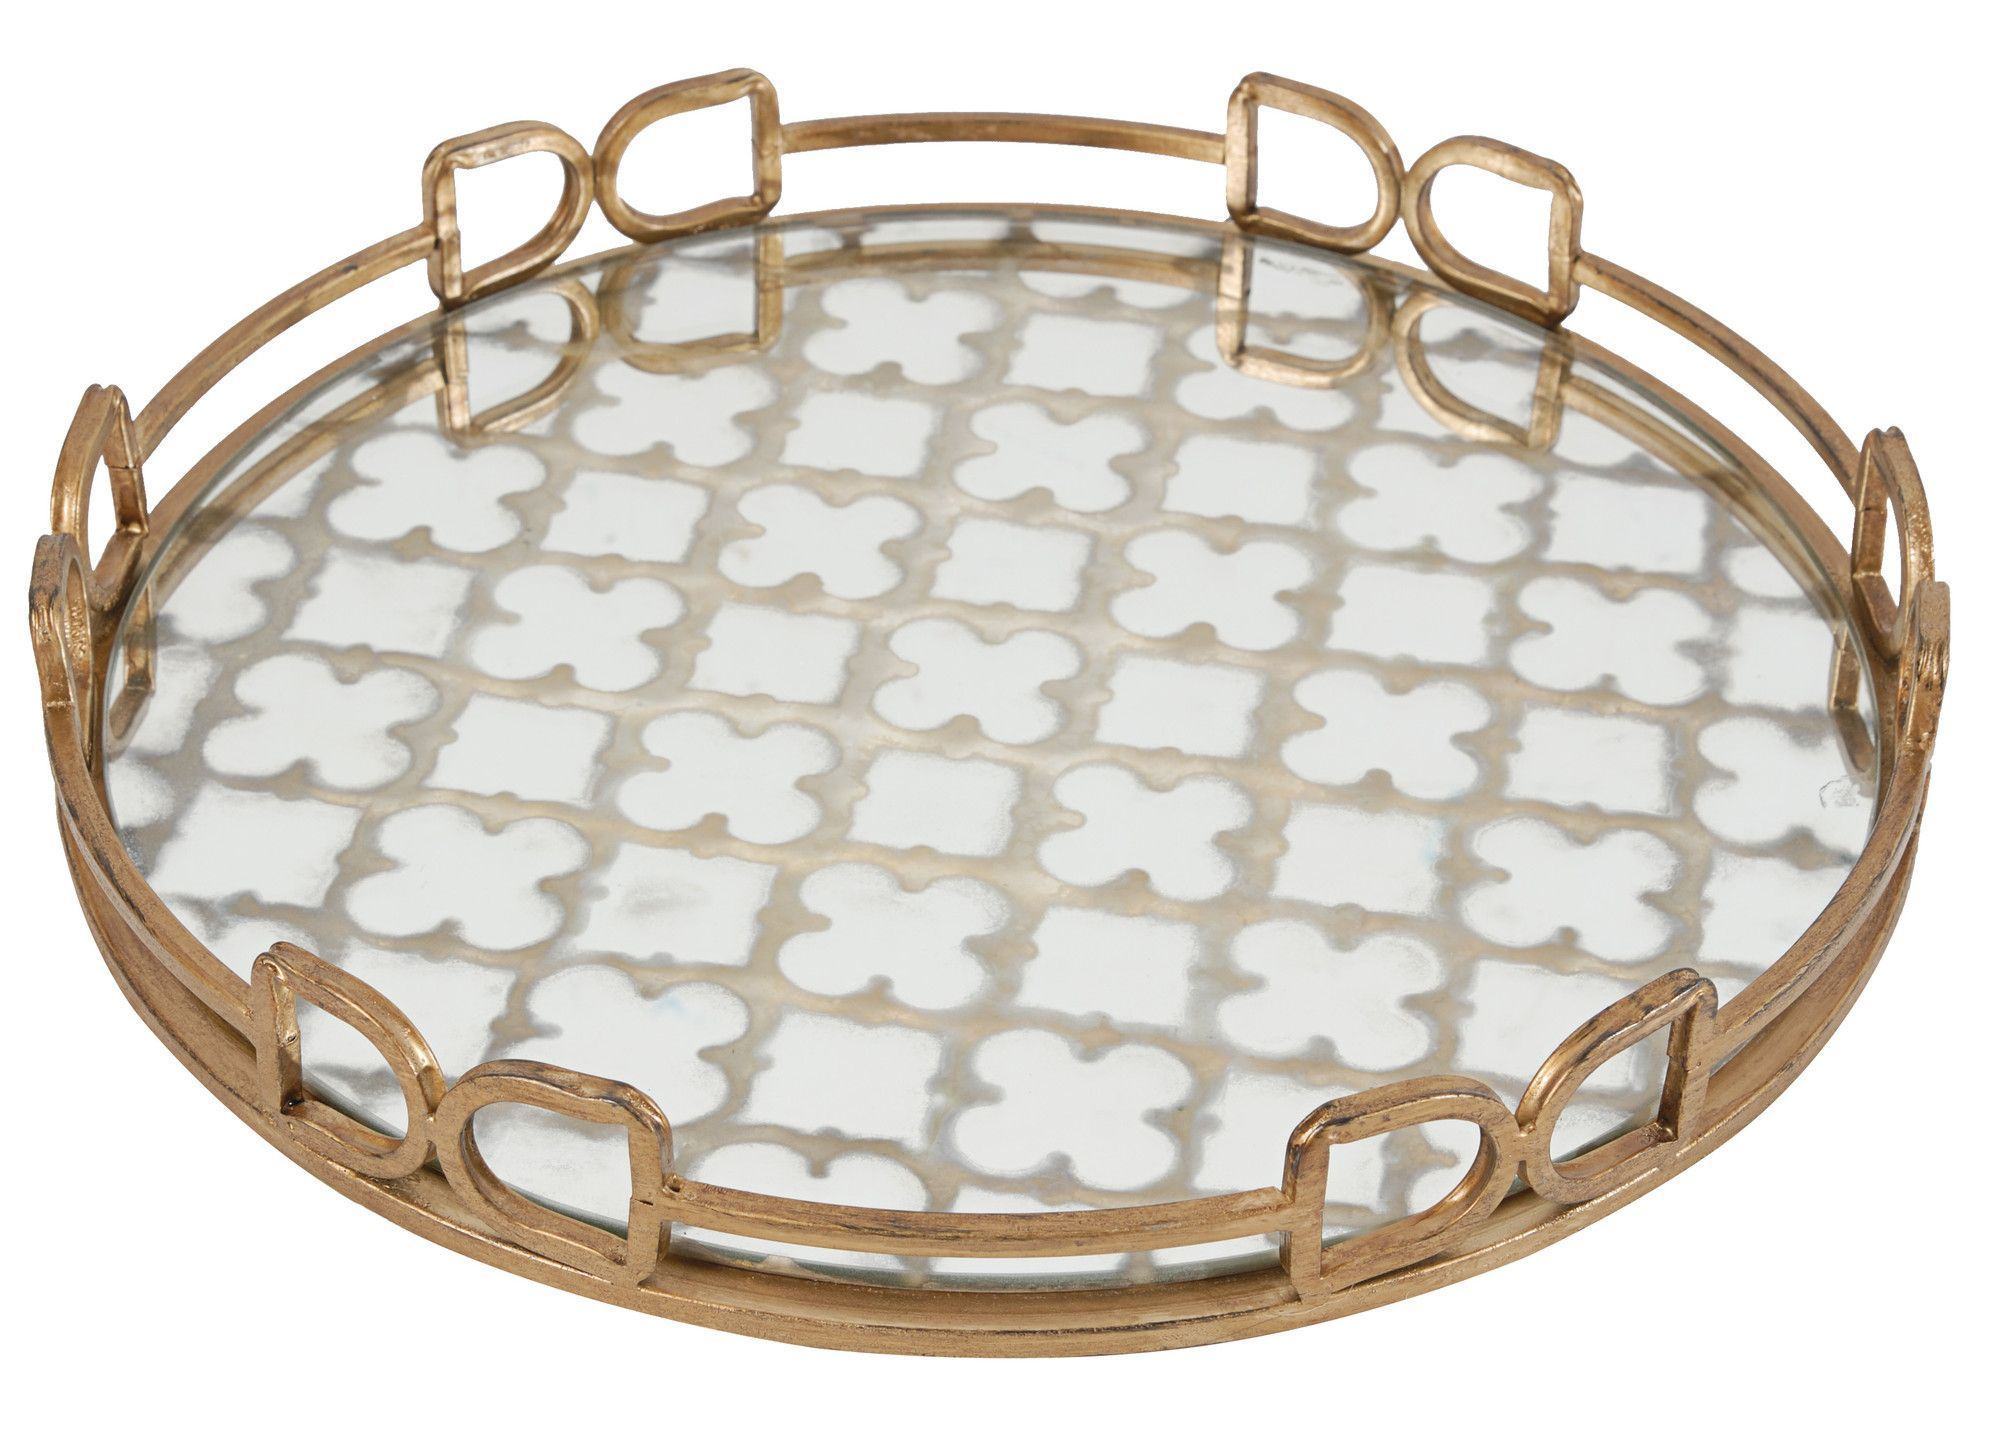 phelan serving tray - Decorative Serving Trays